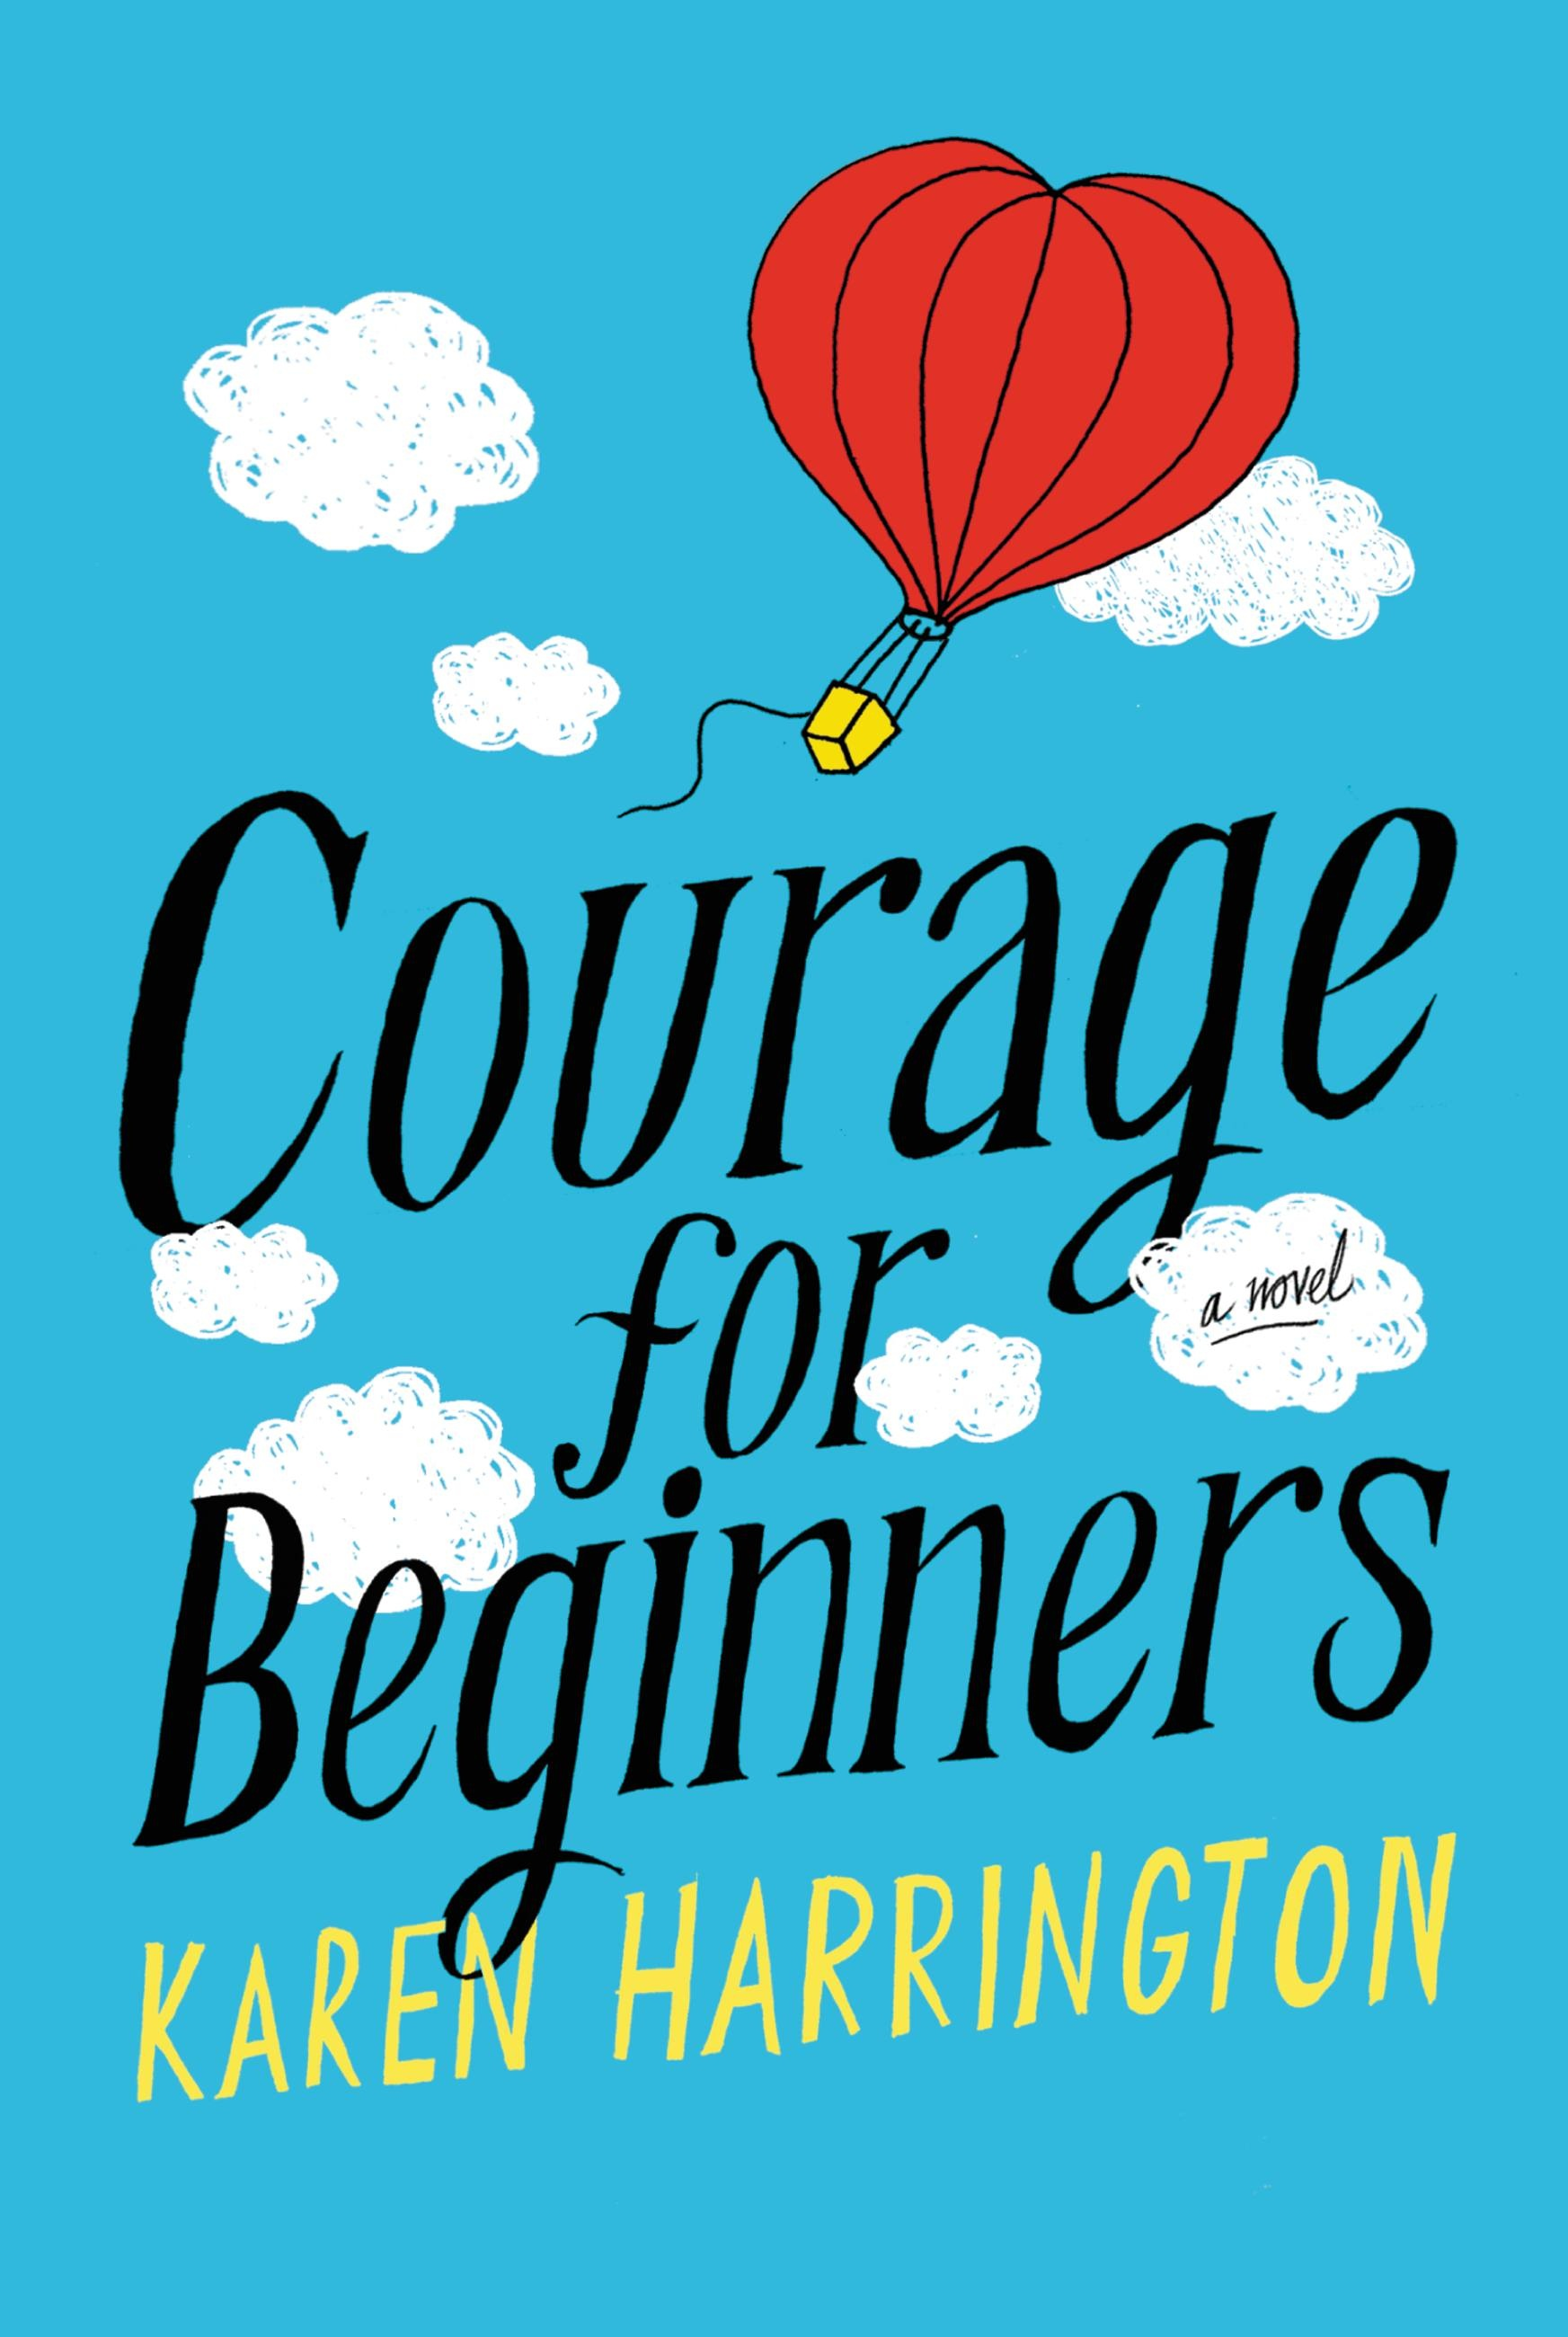 Courage for Beginners by Karen Harrington | Hachette Book ...